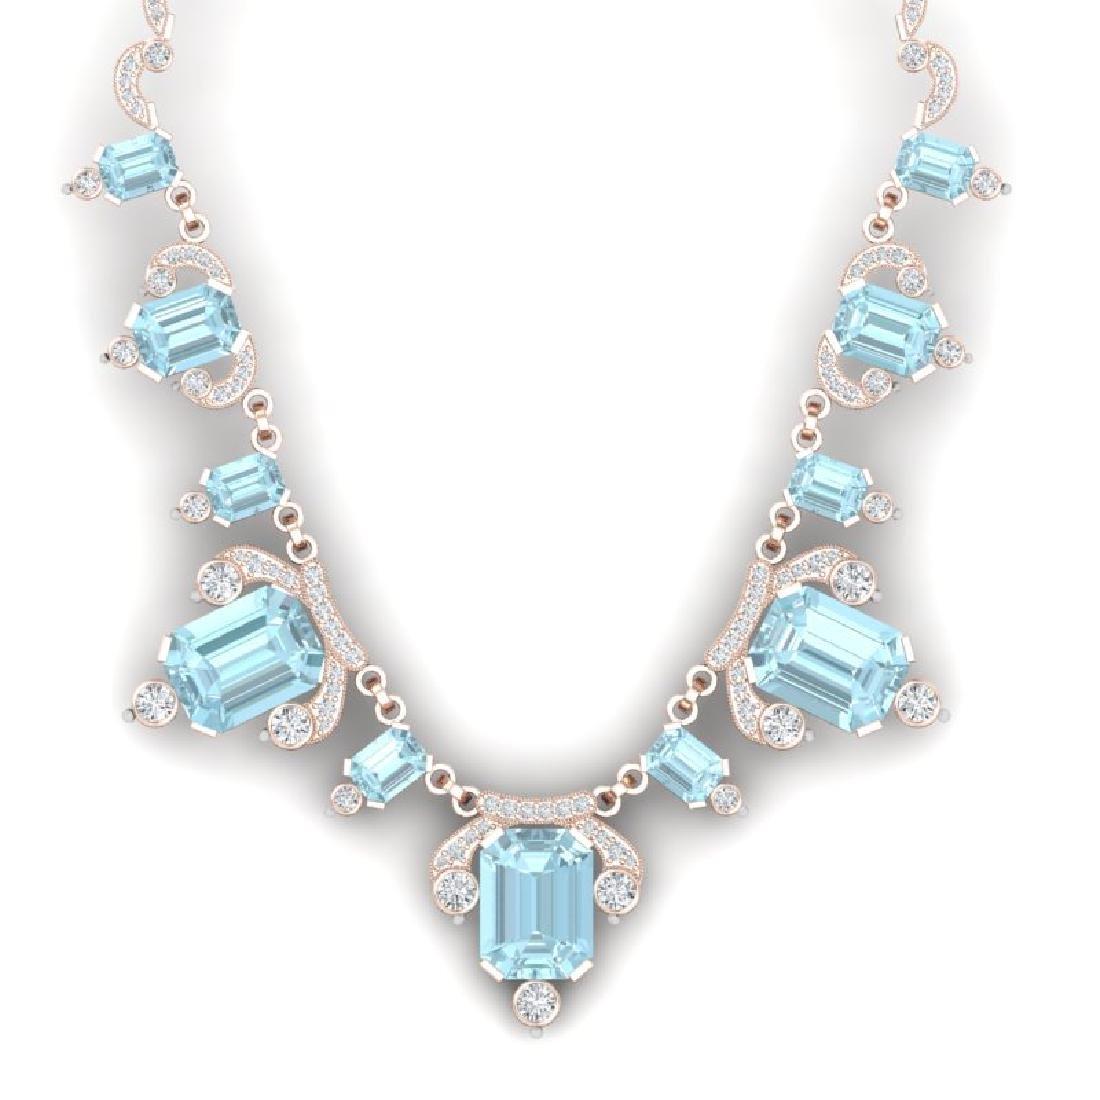 79.56 CTW Royalty Sky Topaz & VS Diamond Necklace 18K